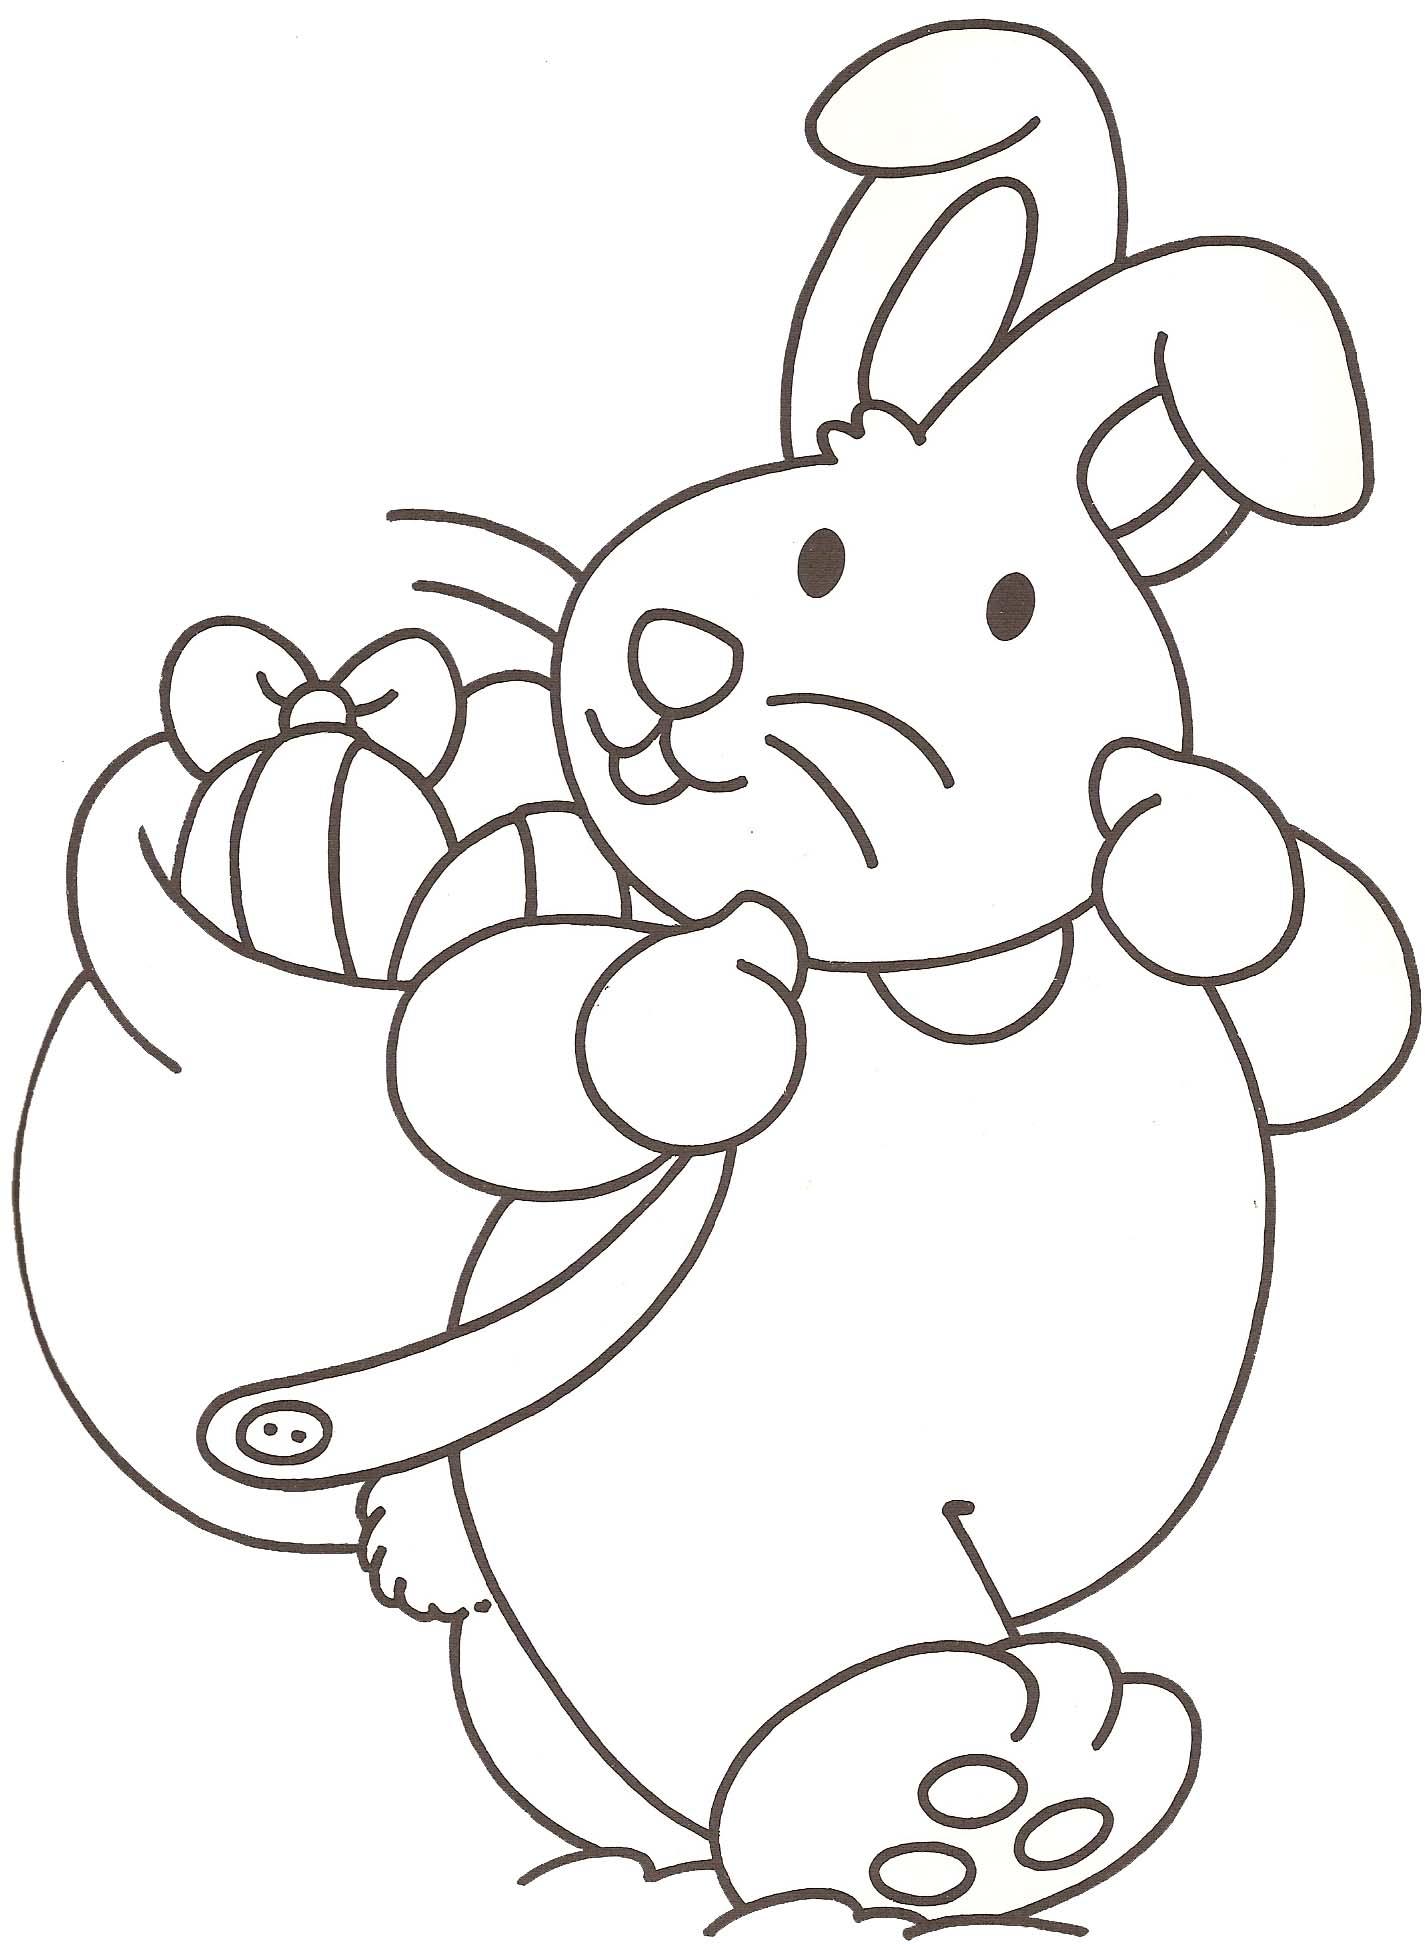 Dessin gratuit de lapin a imprimer